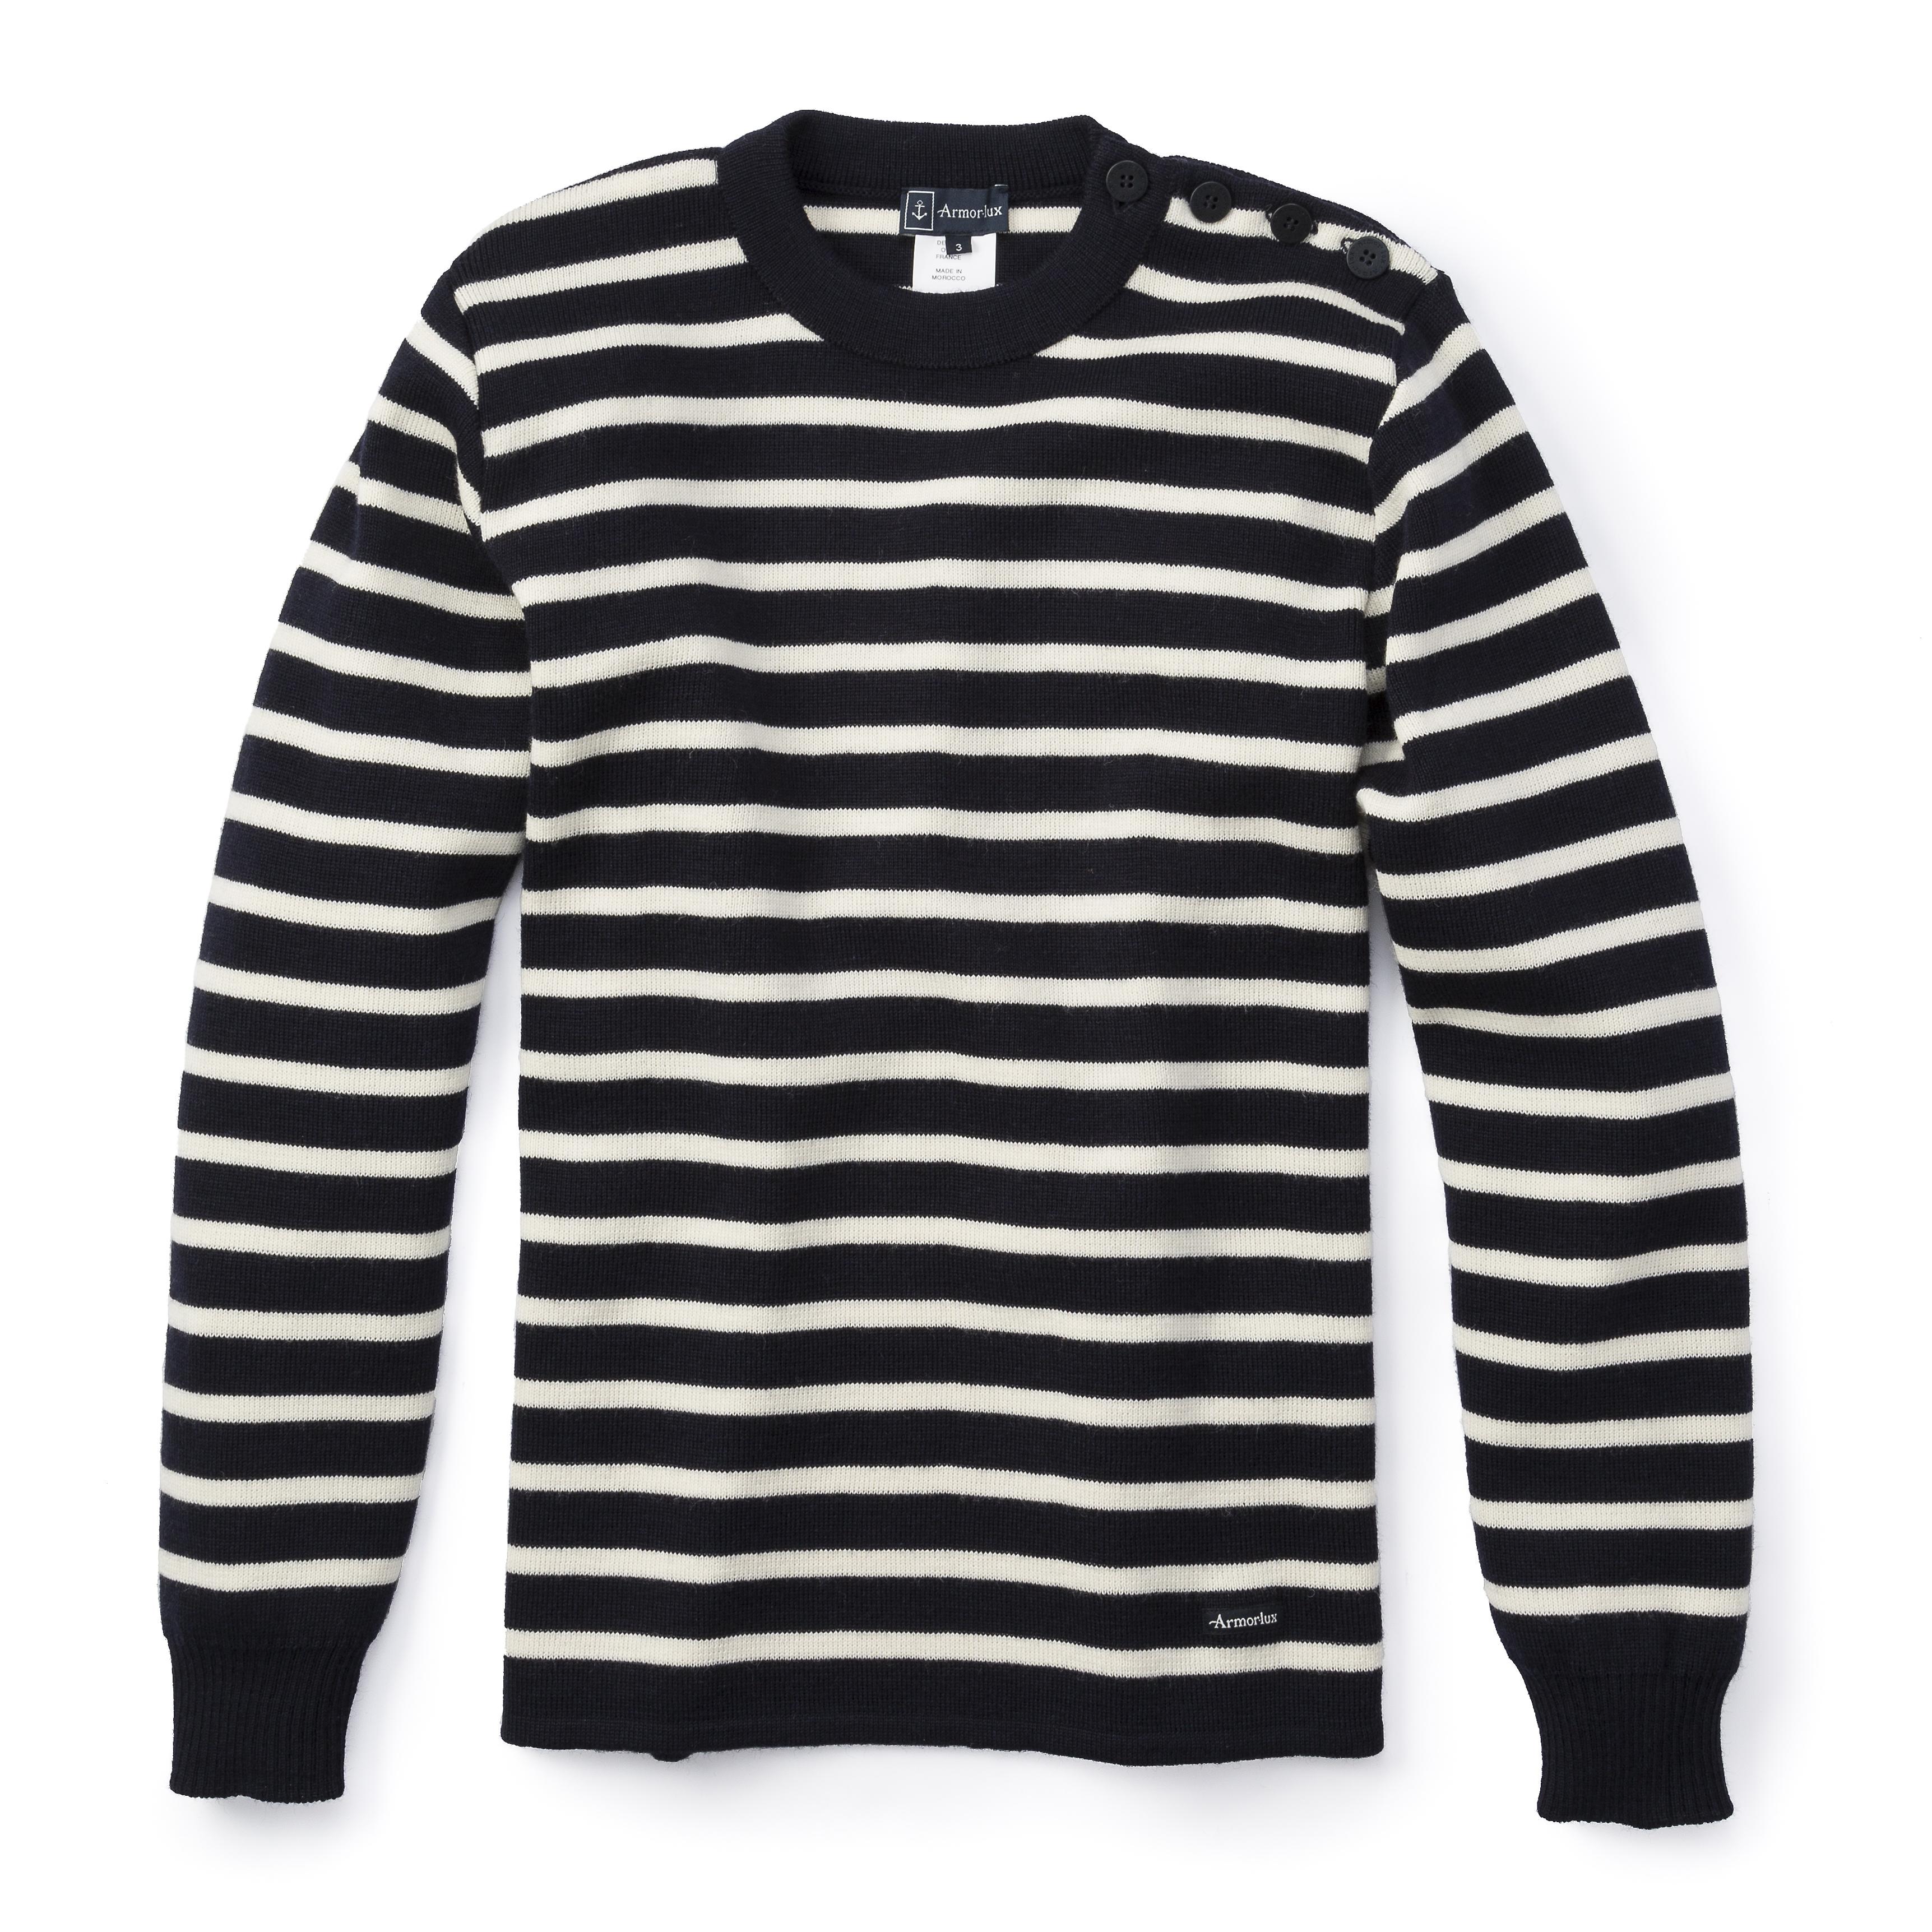 Armor-Lux Wool Striped Sweater | Huckberry